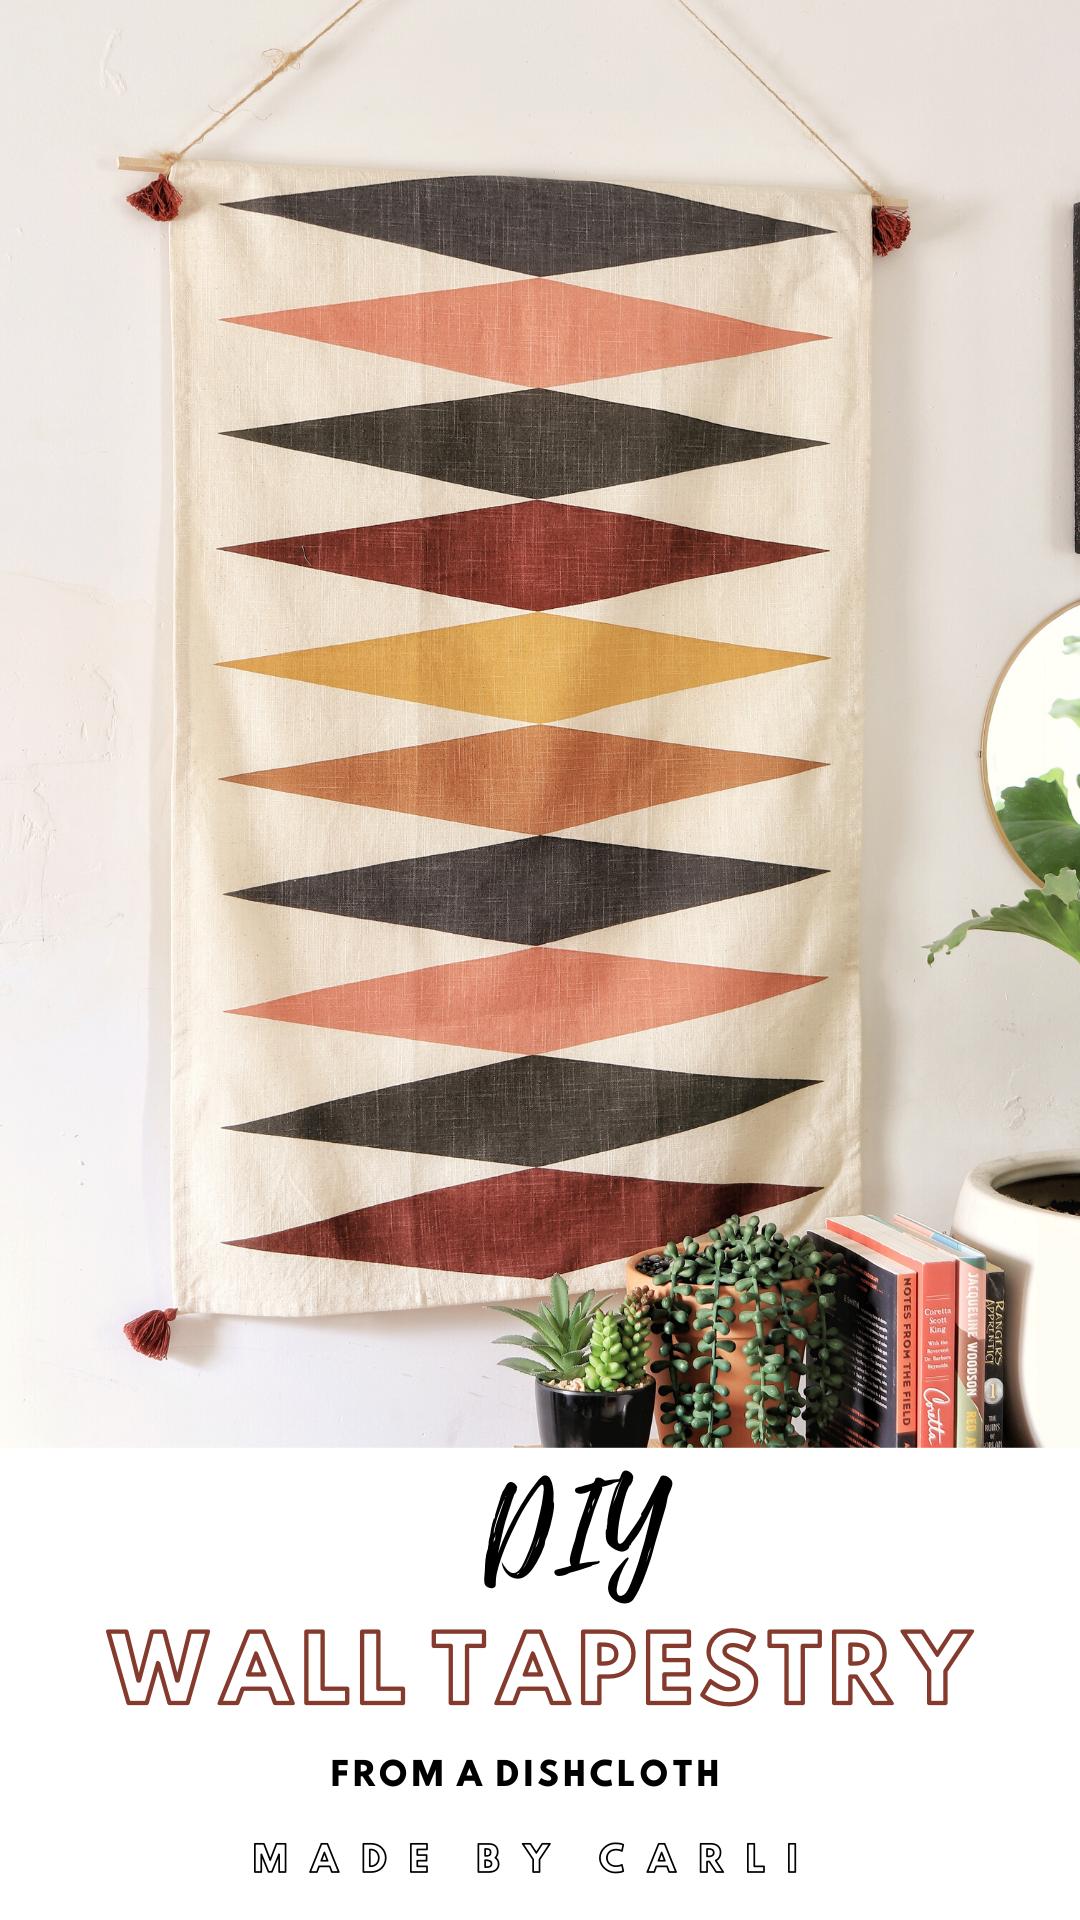 disah towel wall tapestry